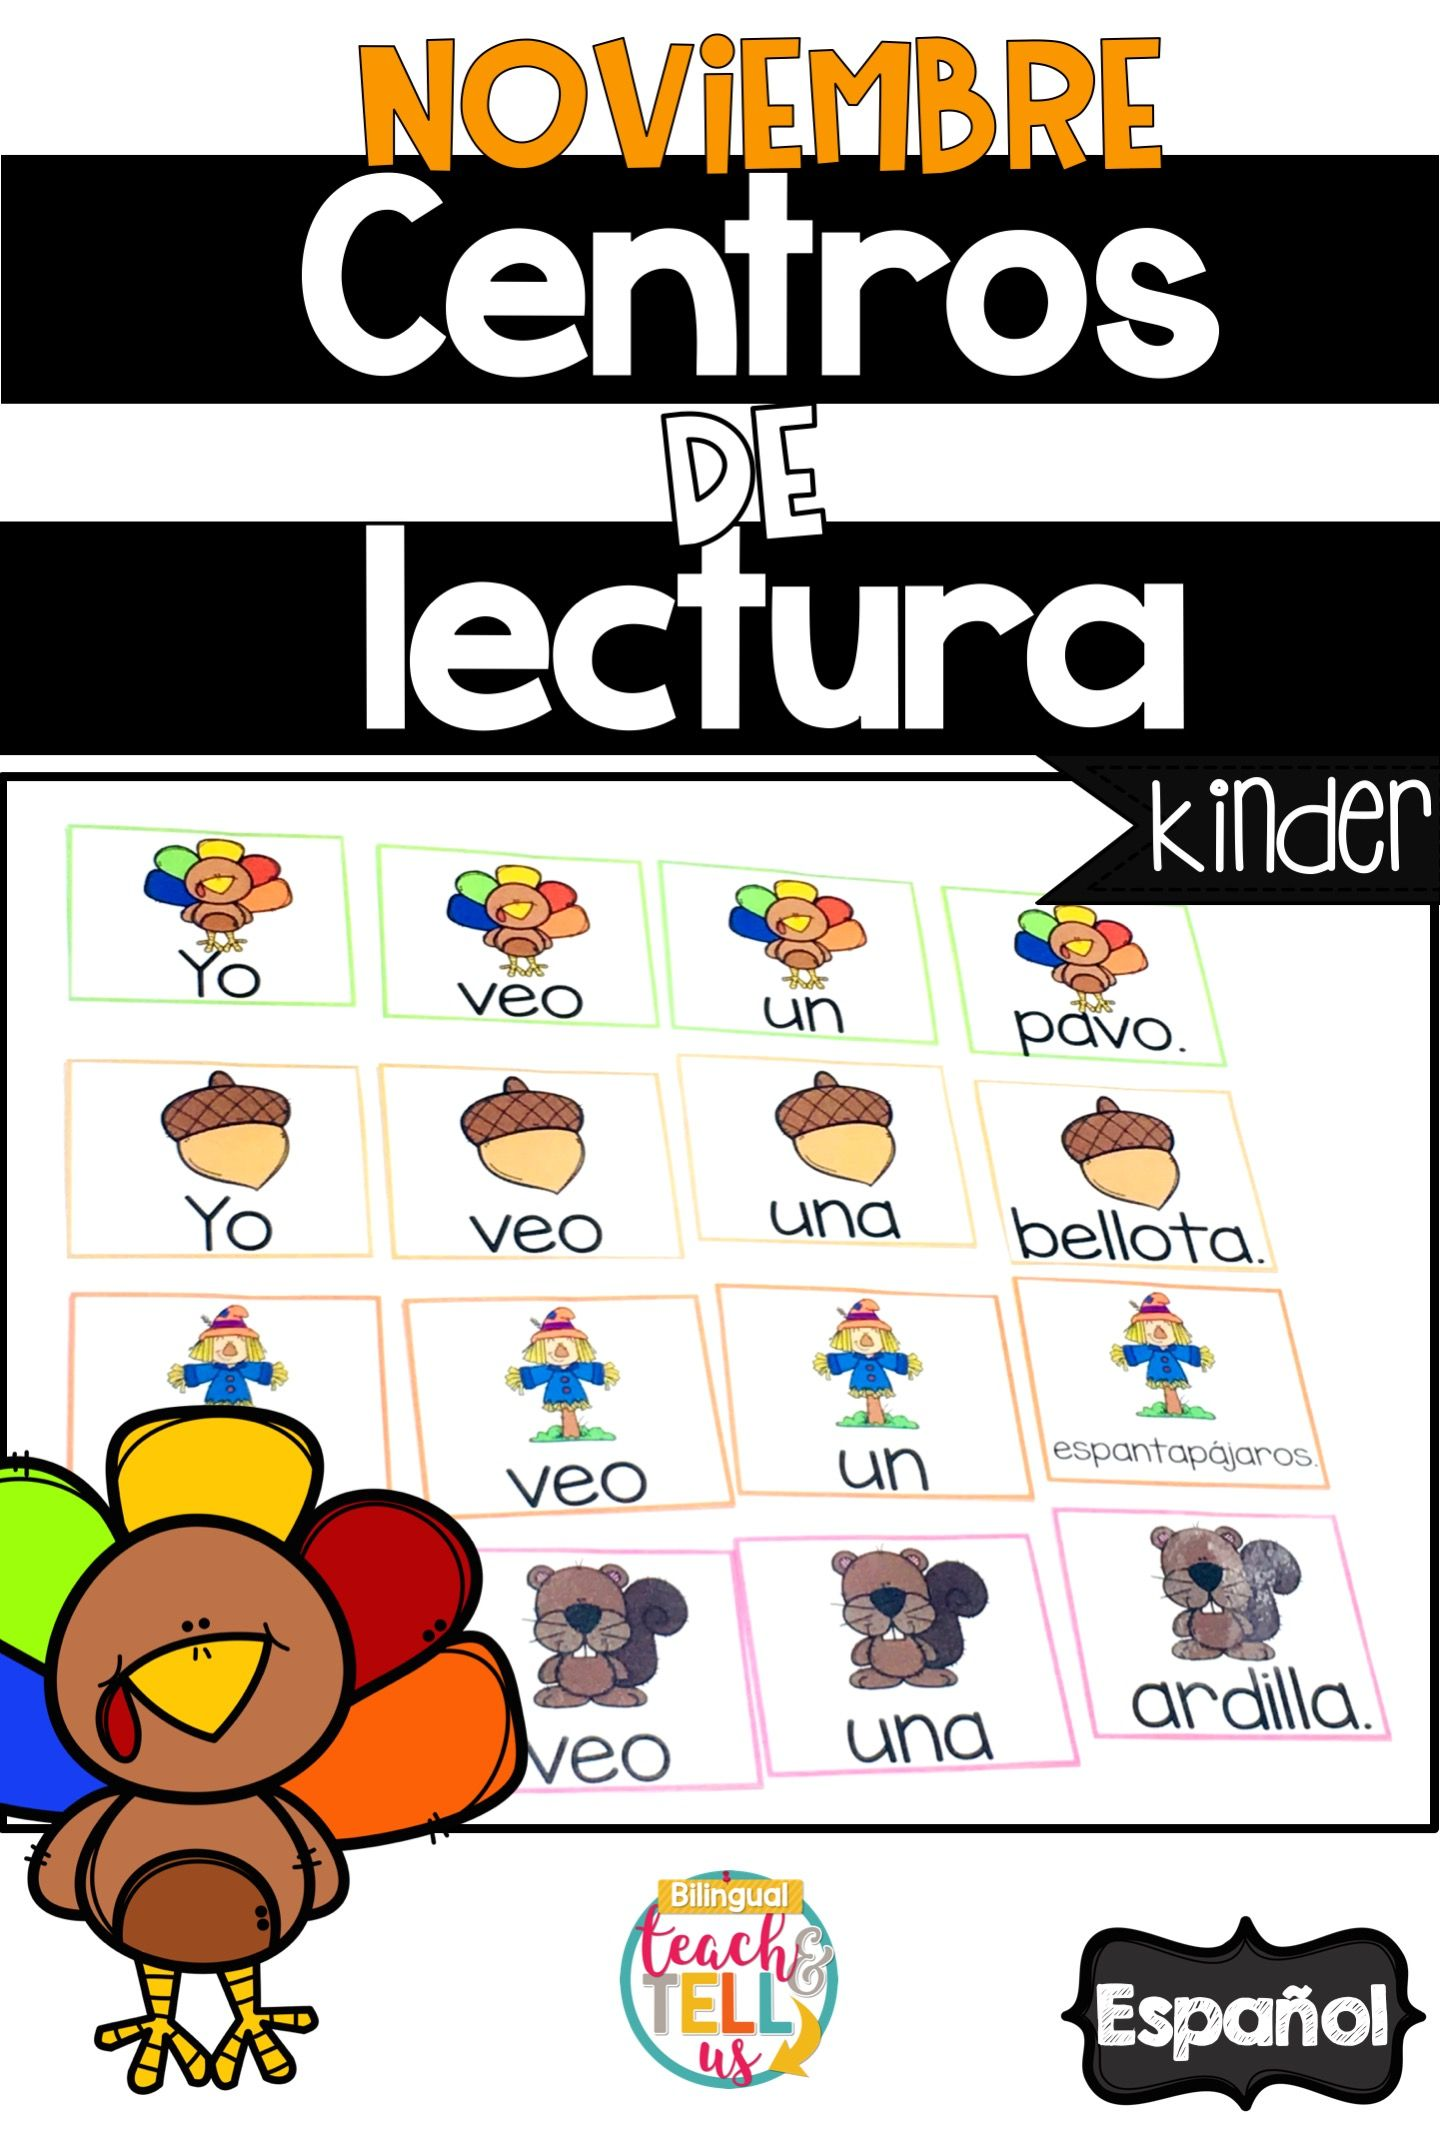 Kindergarten November Literacy Centers Ideas In Spanish To